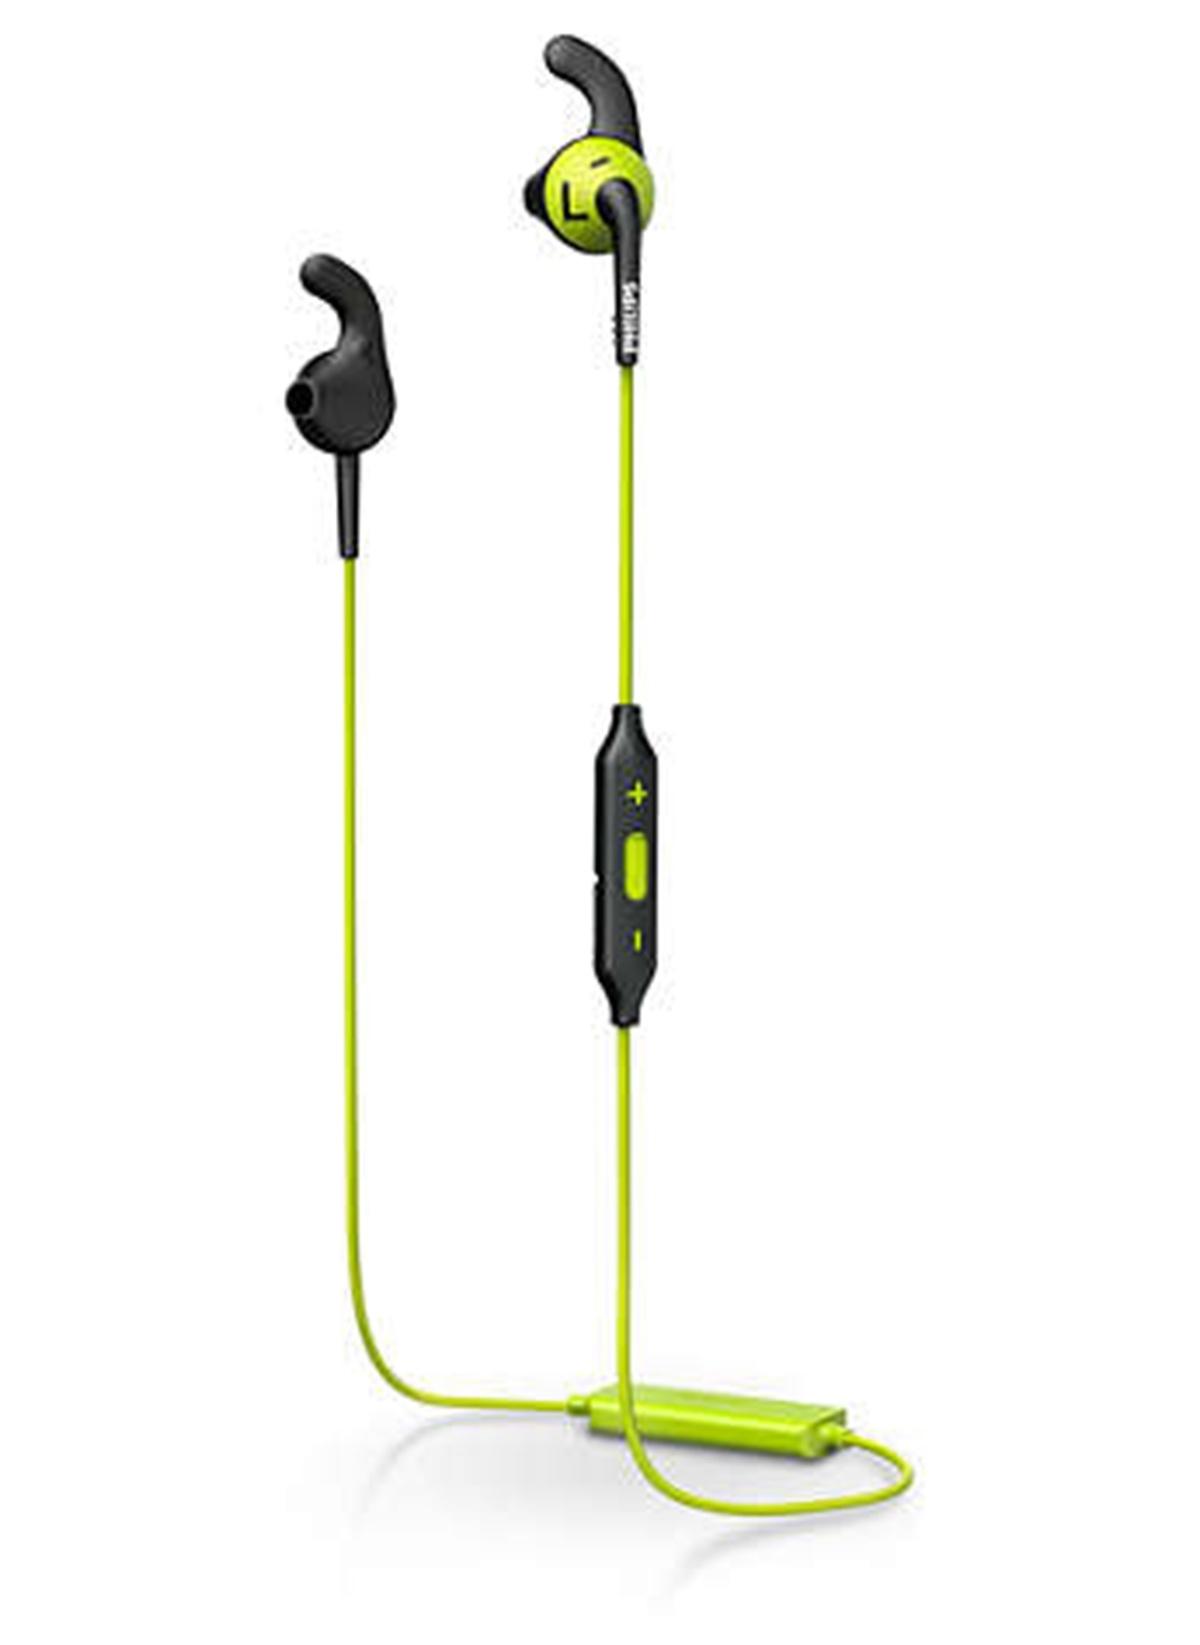 Standart Philips ActionFit SHQ6500CL Wireless Kulakiçi Bluetooth Kulaklık